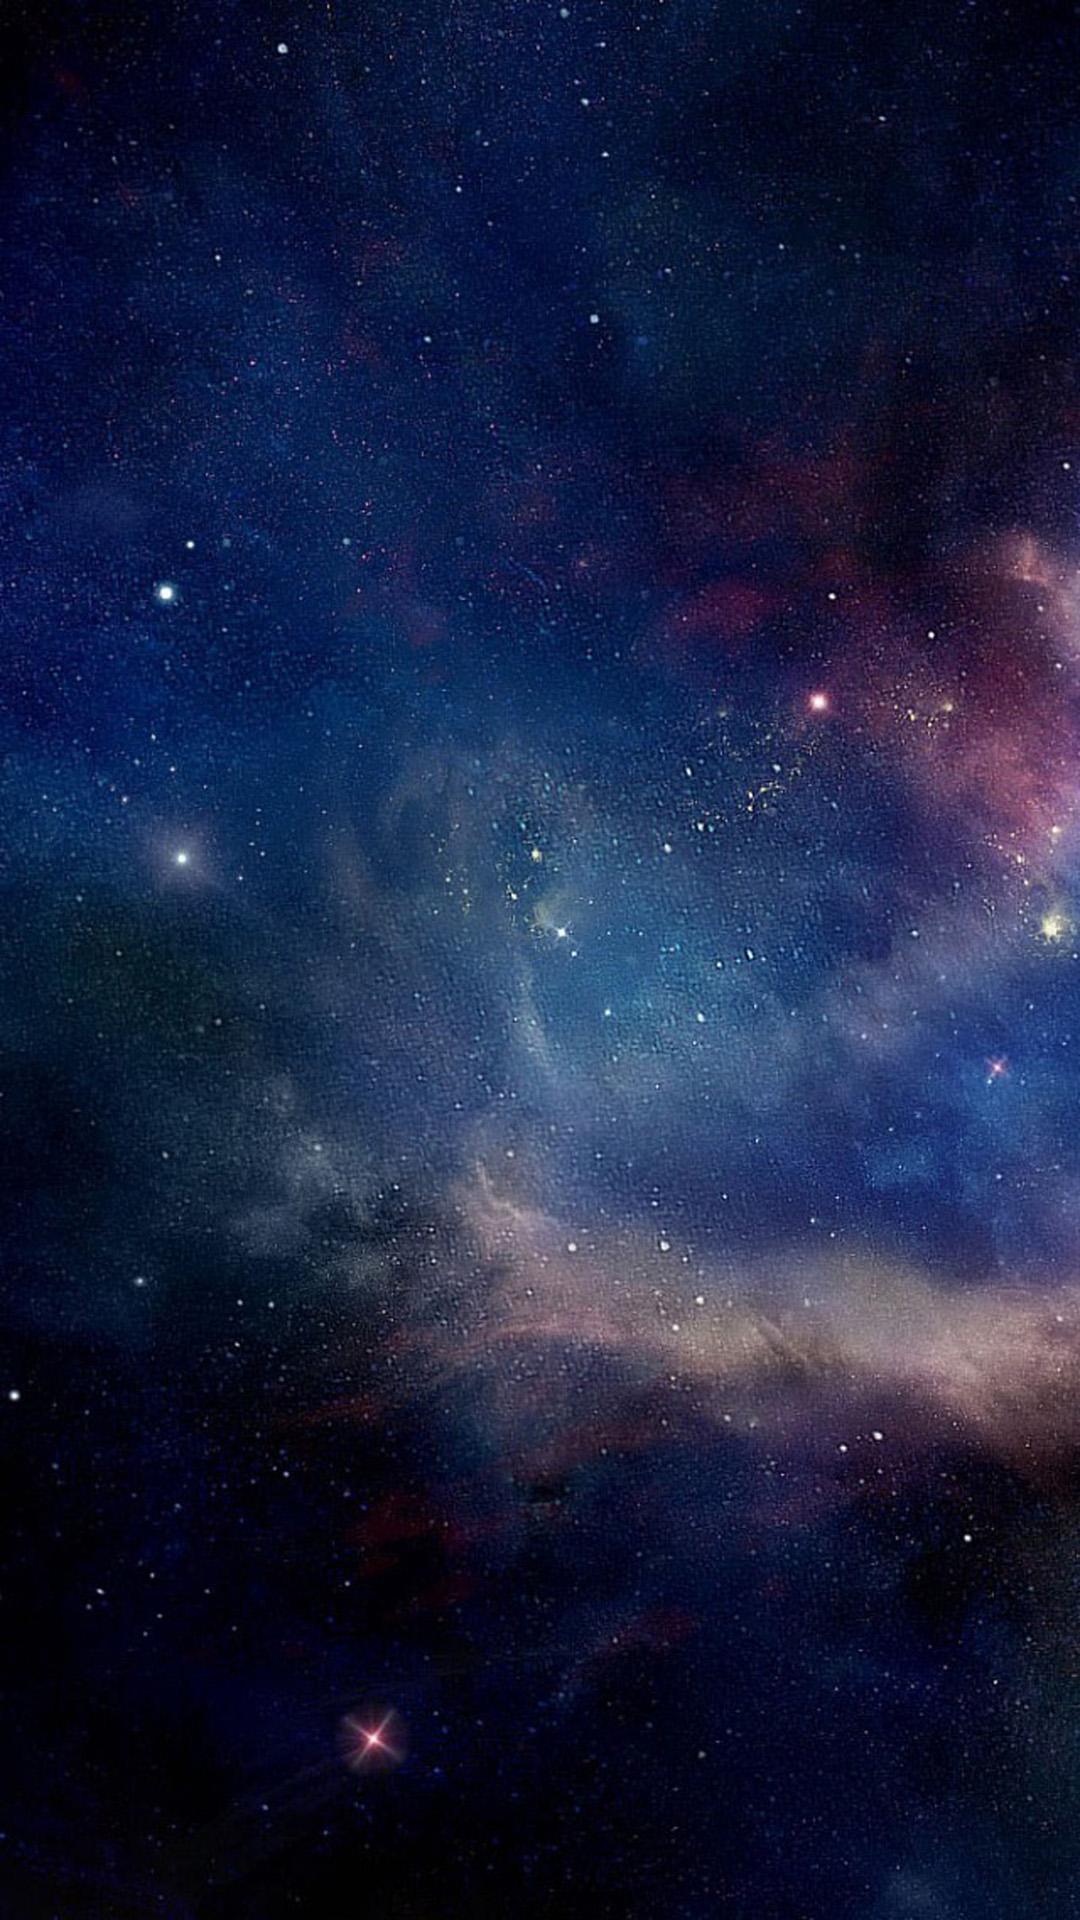 Galaxy S5 Wallpaper Related galaxy s5 wallpaper 1080x1920